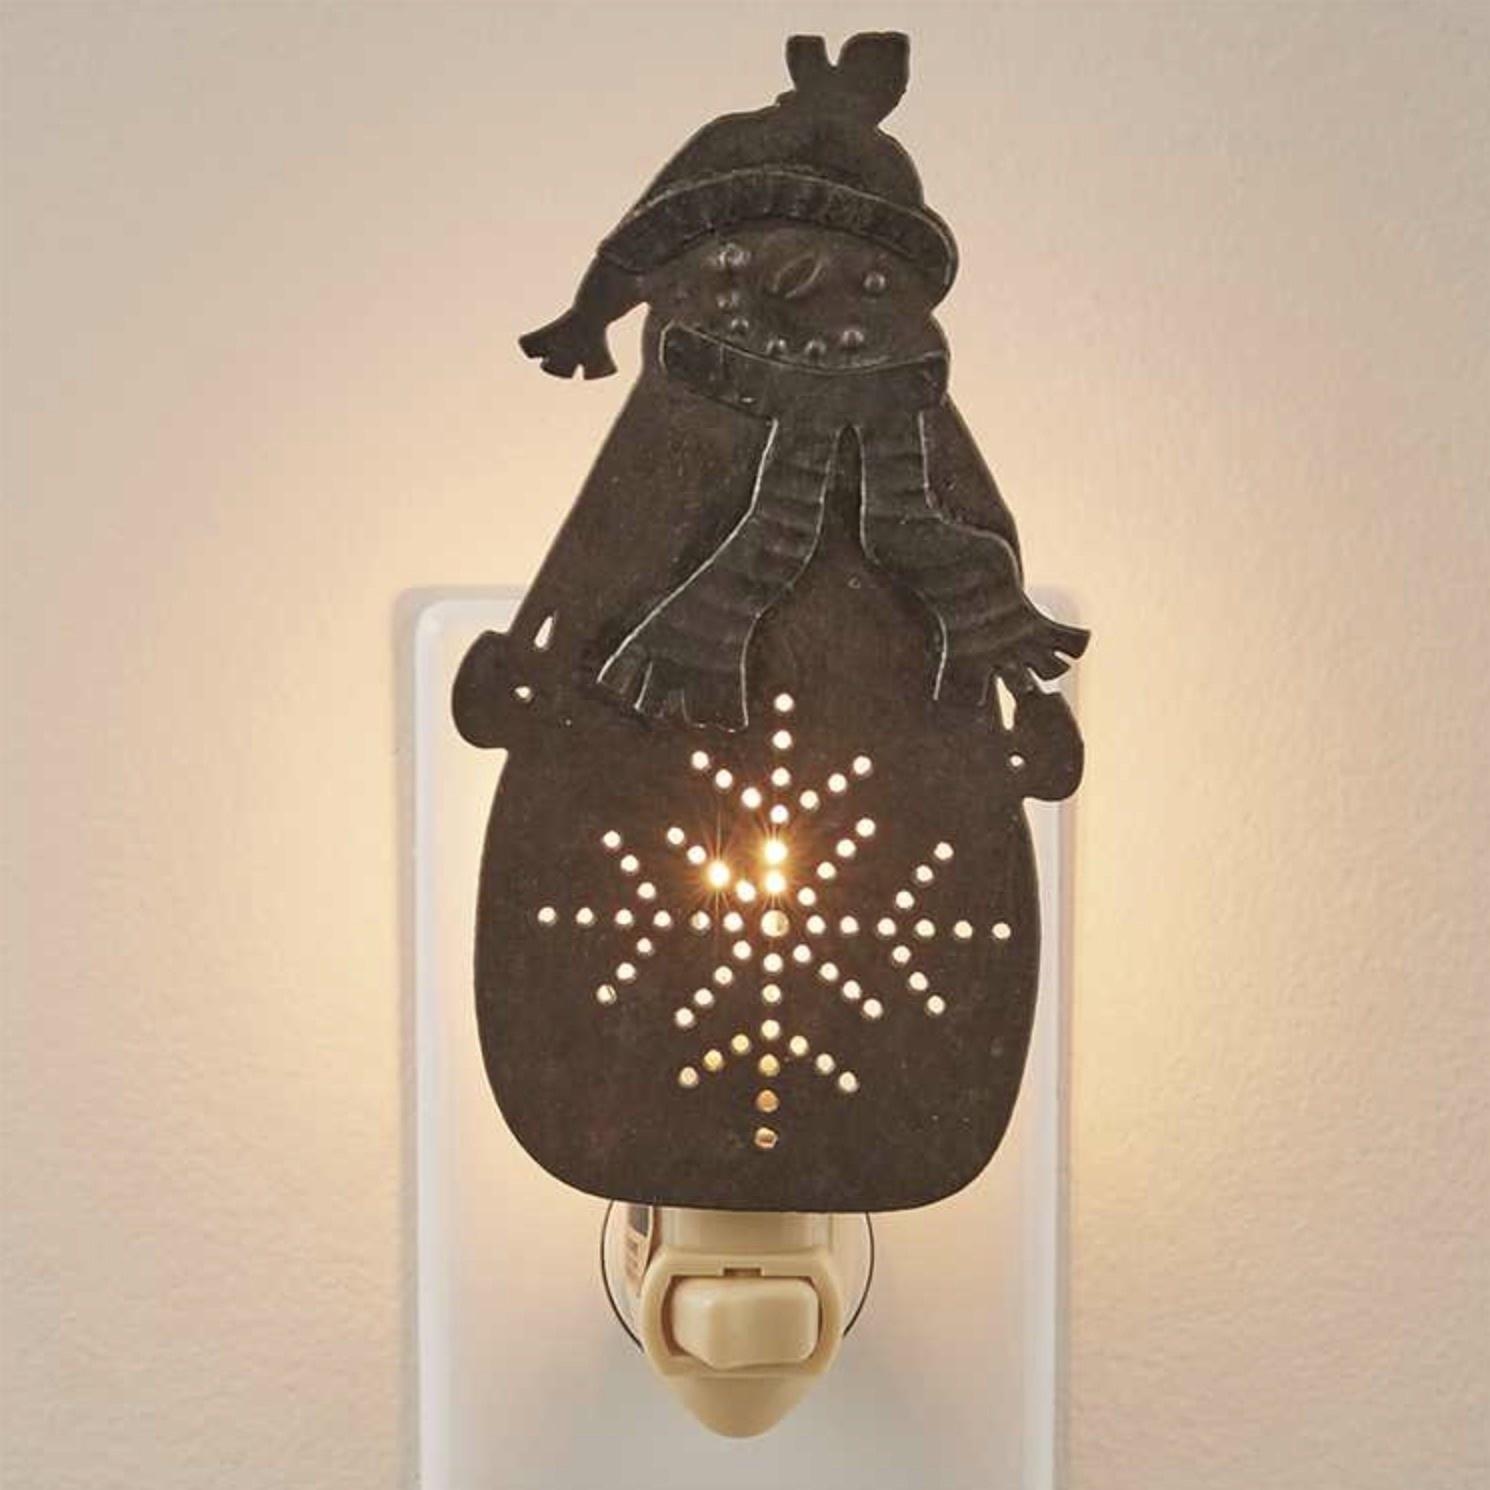 Park Designs Northwoods Snowman Night Light